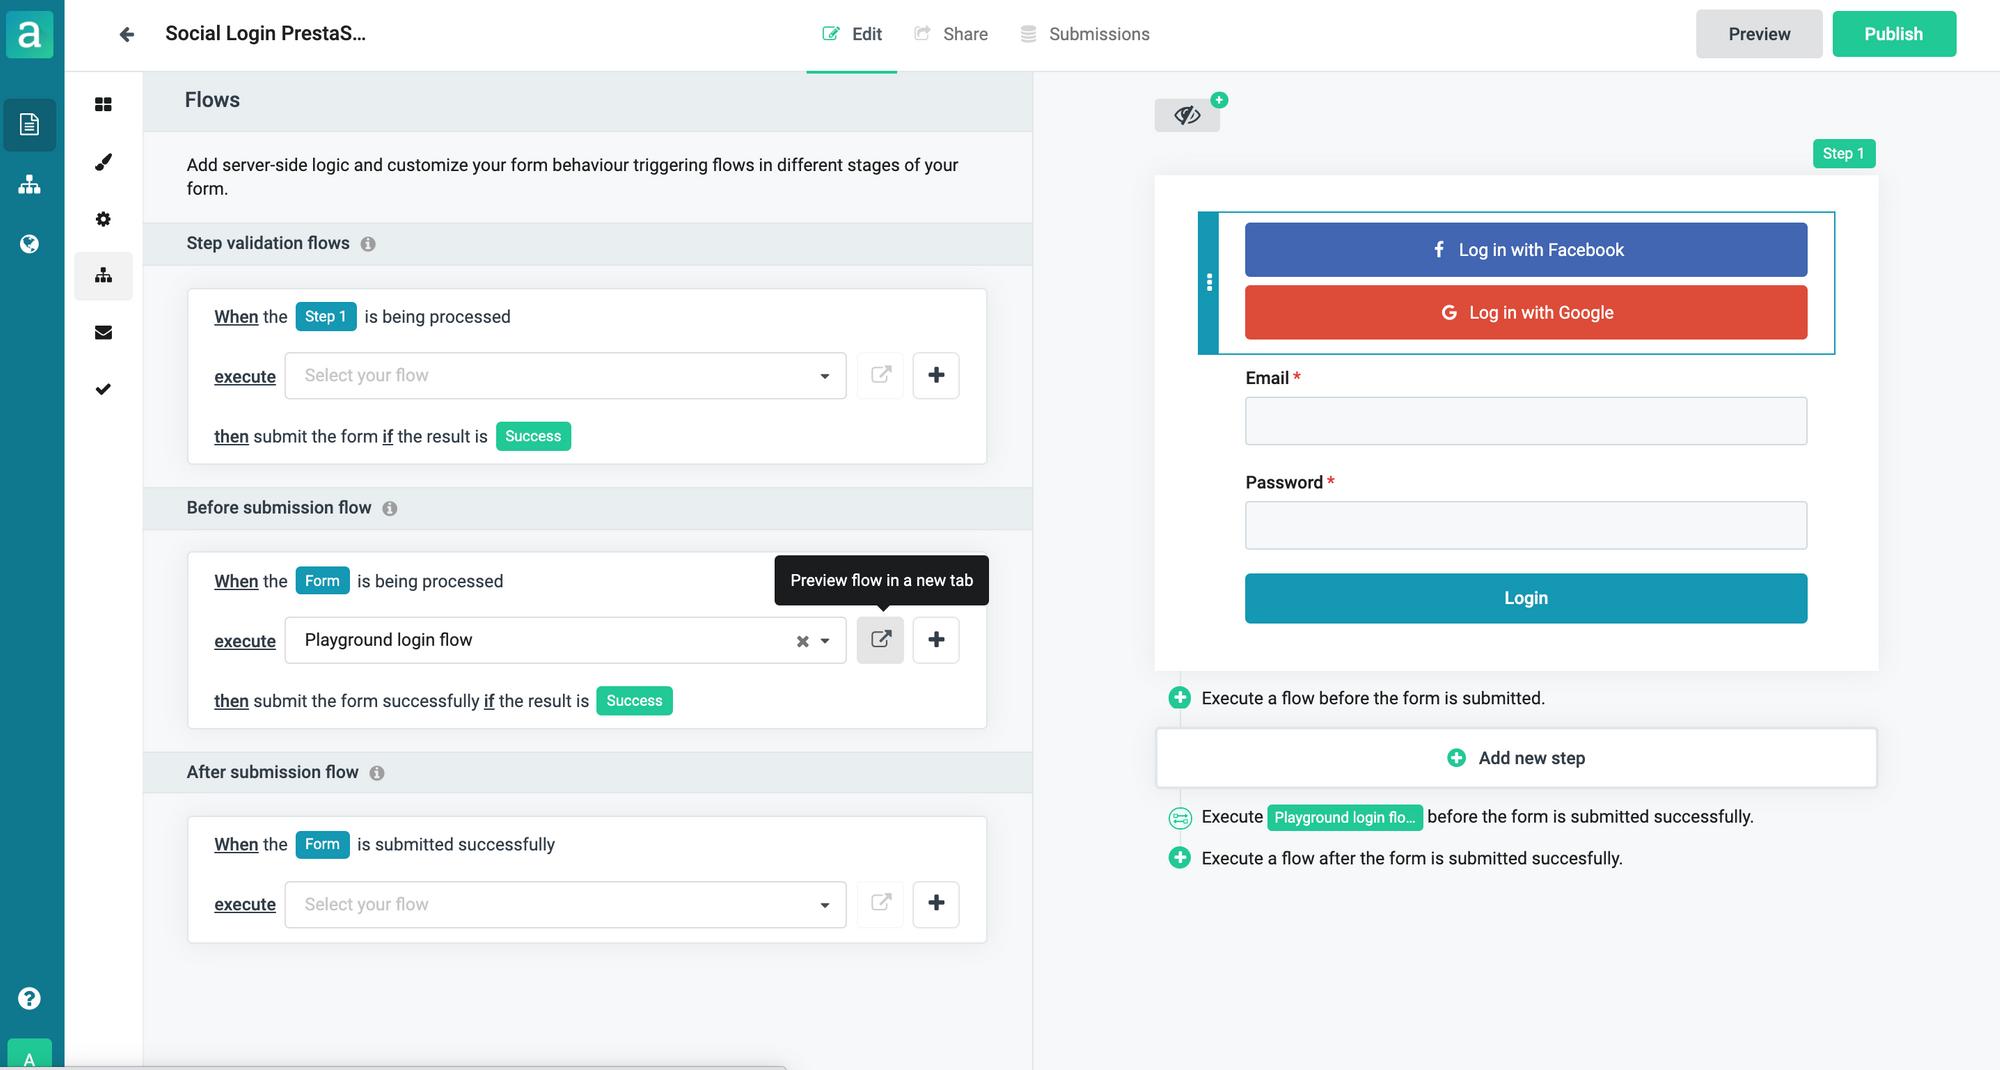 Social login forms for PrestaShop